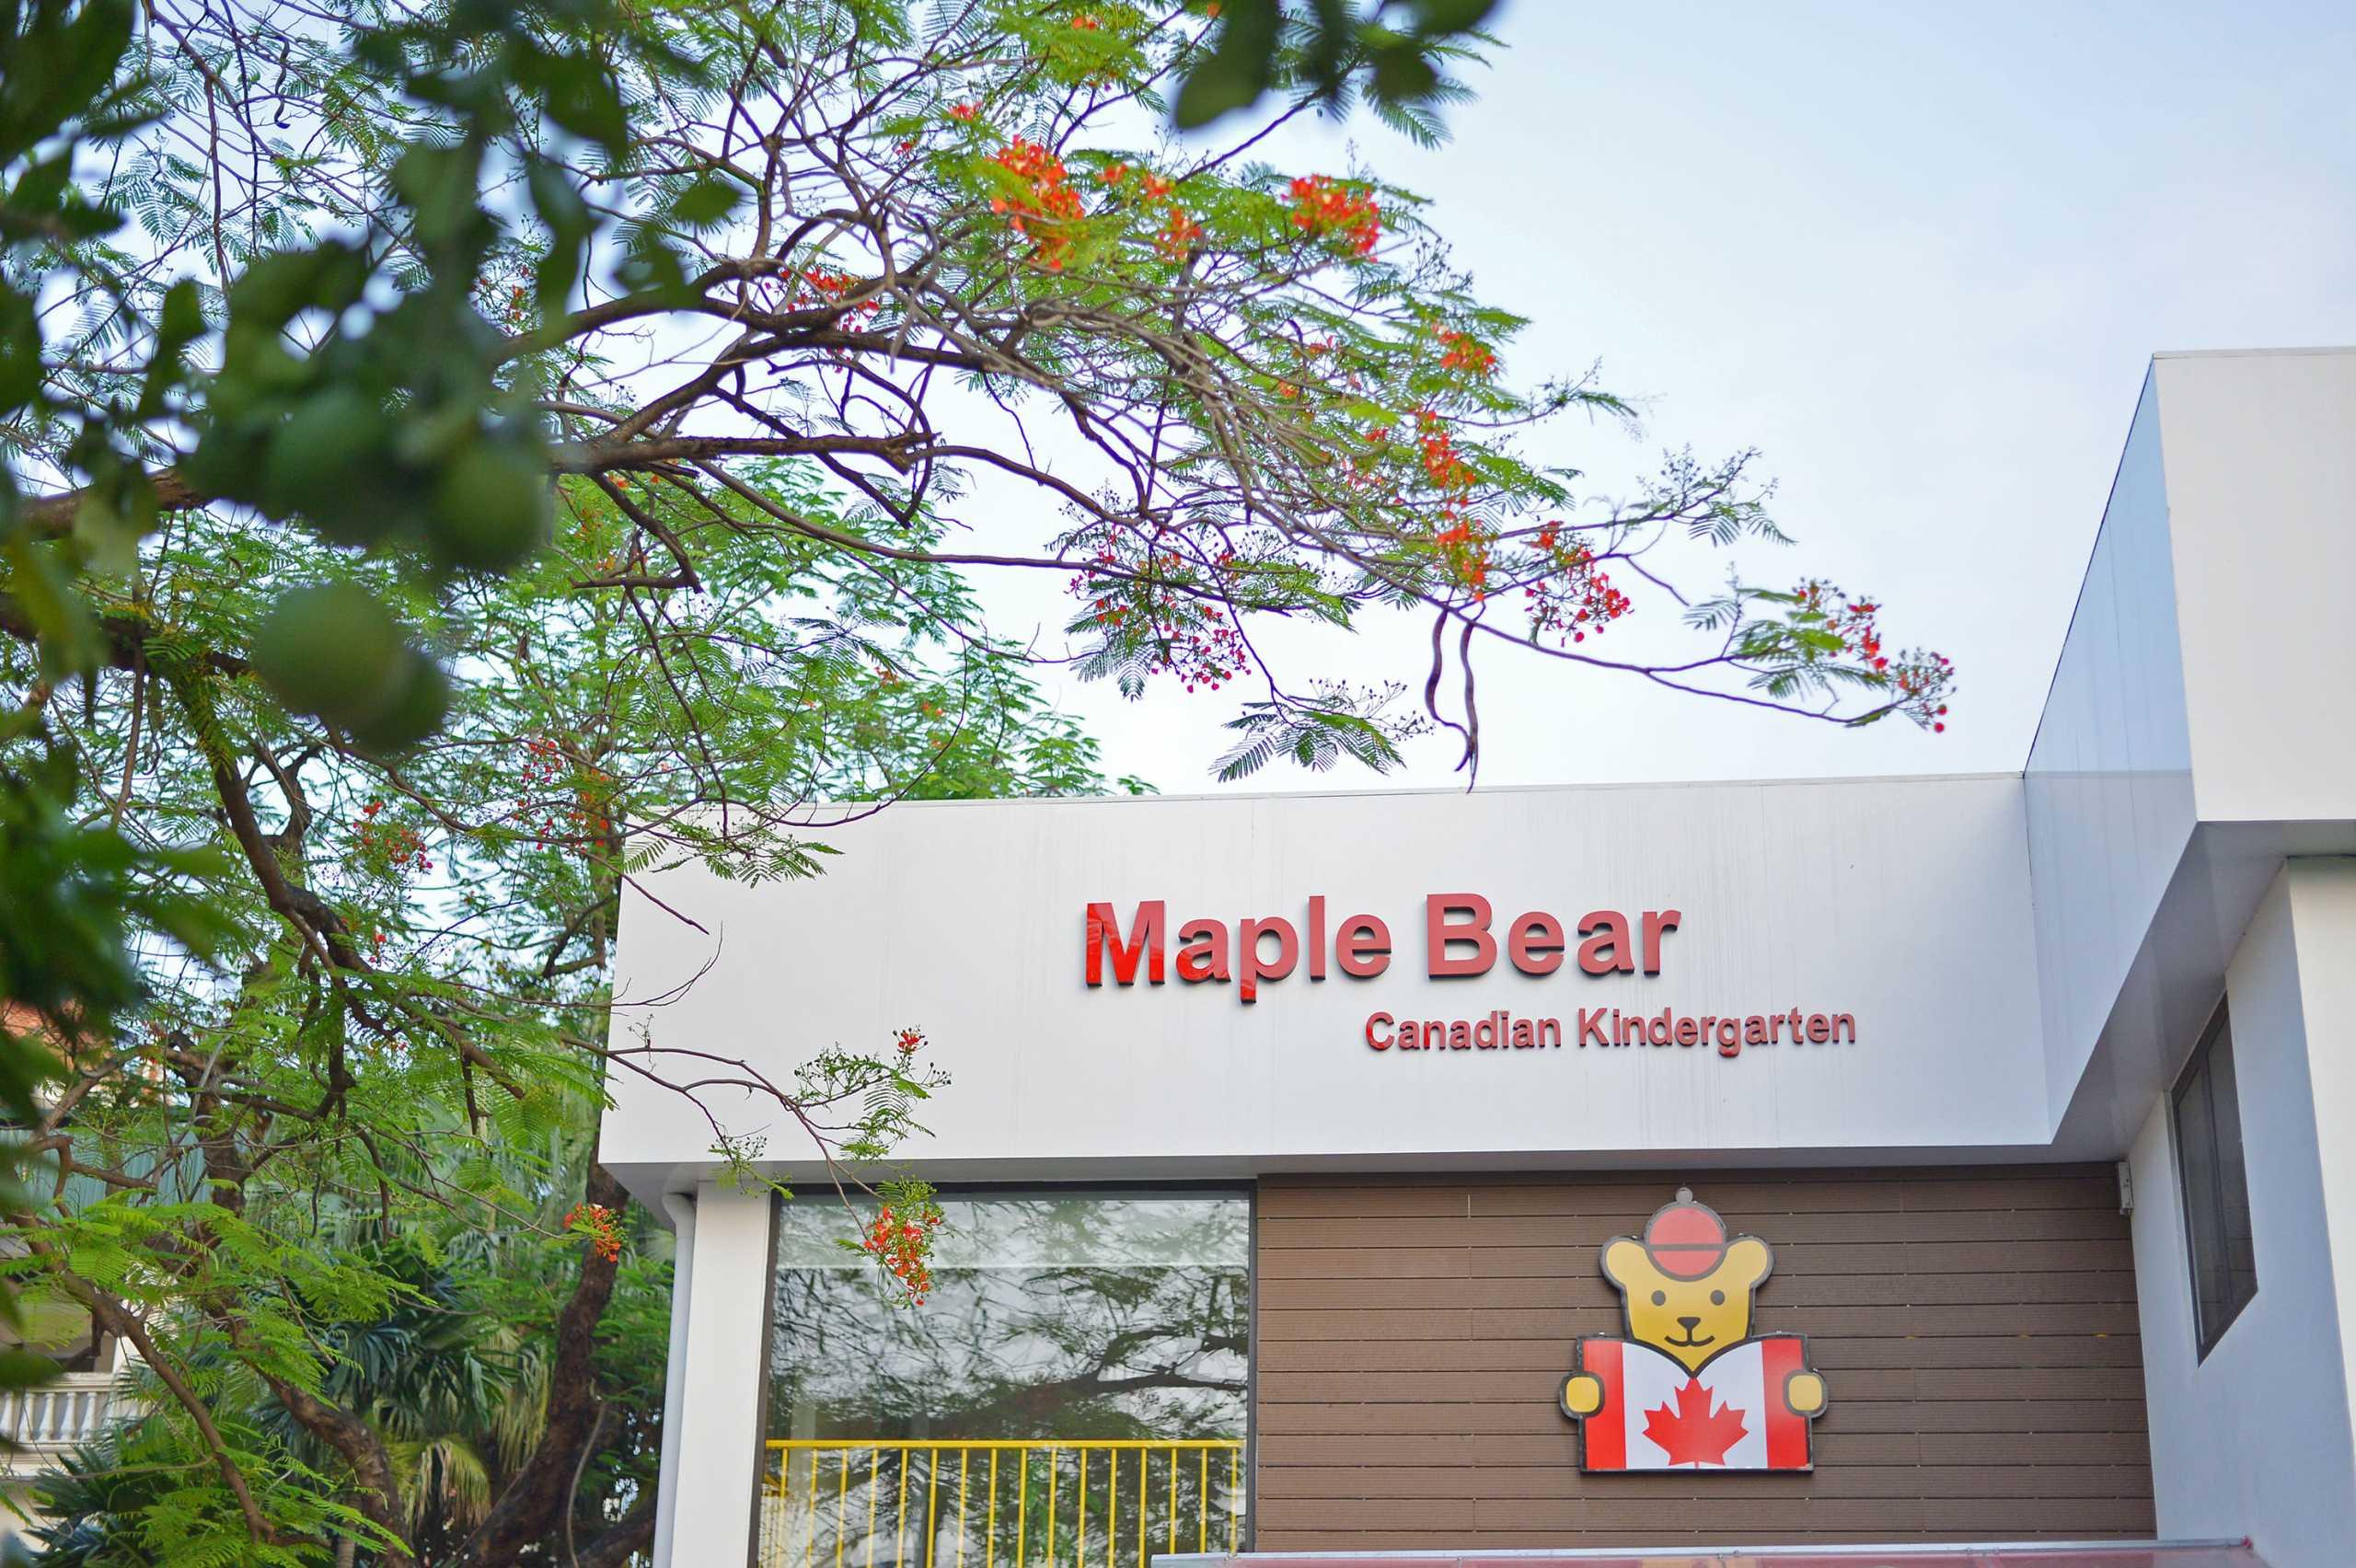 Maple Bear: Τα καναδικά σχολεία ετοιμάζουν την «είσοδό» τους στην ελληνική αγορά